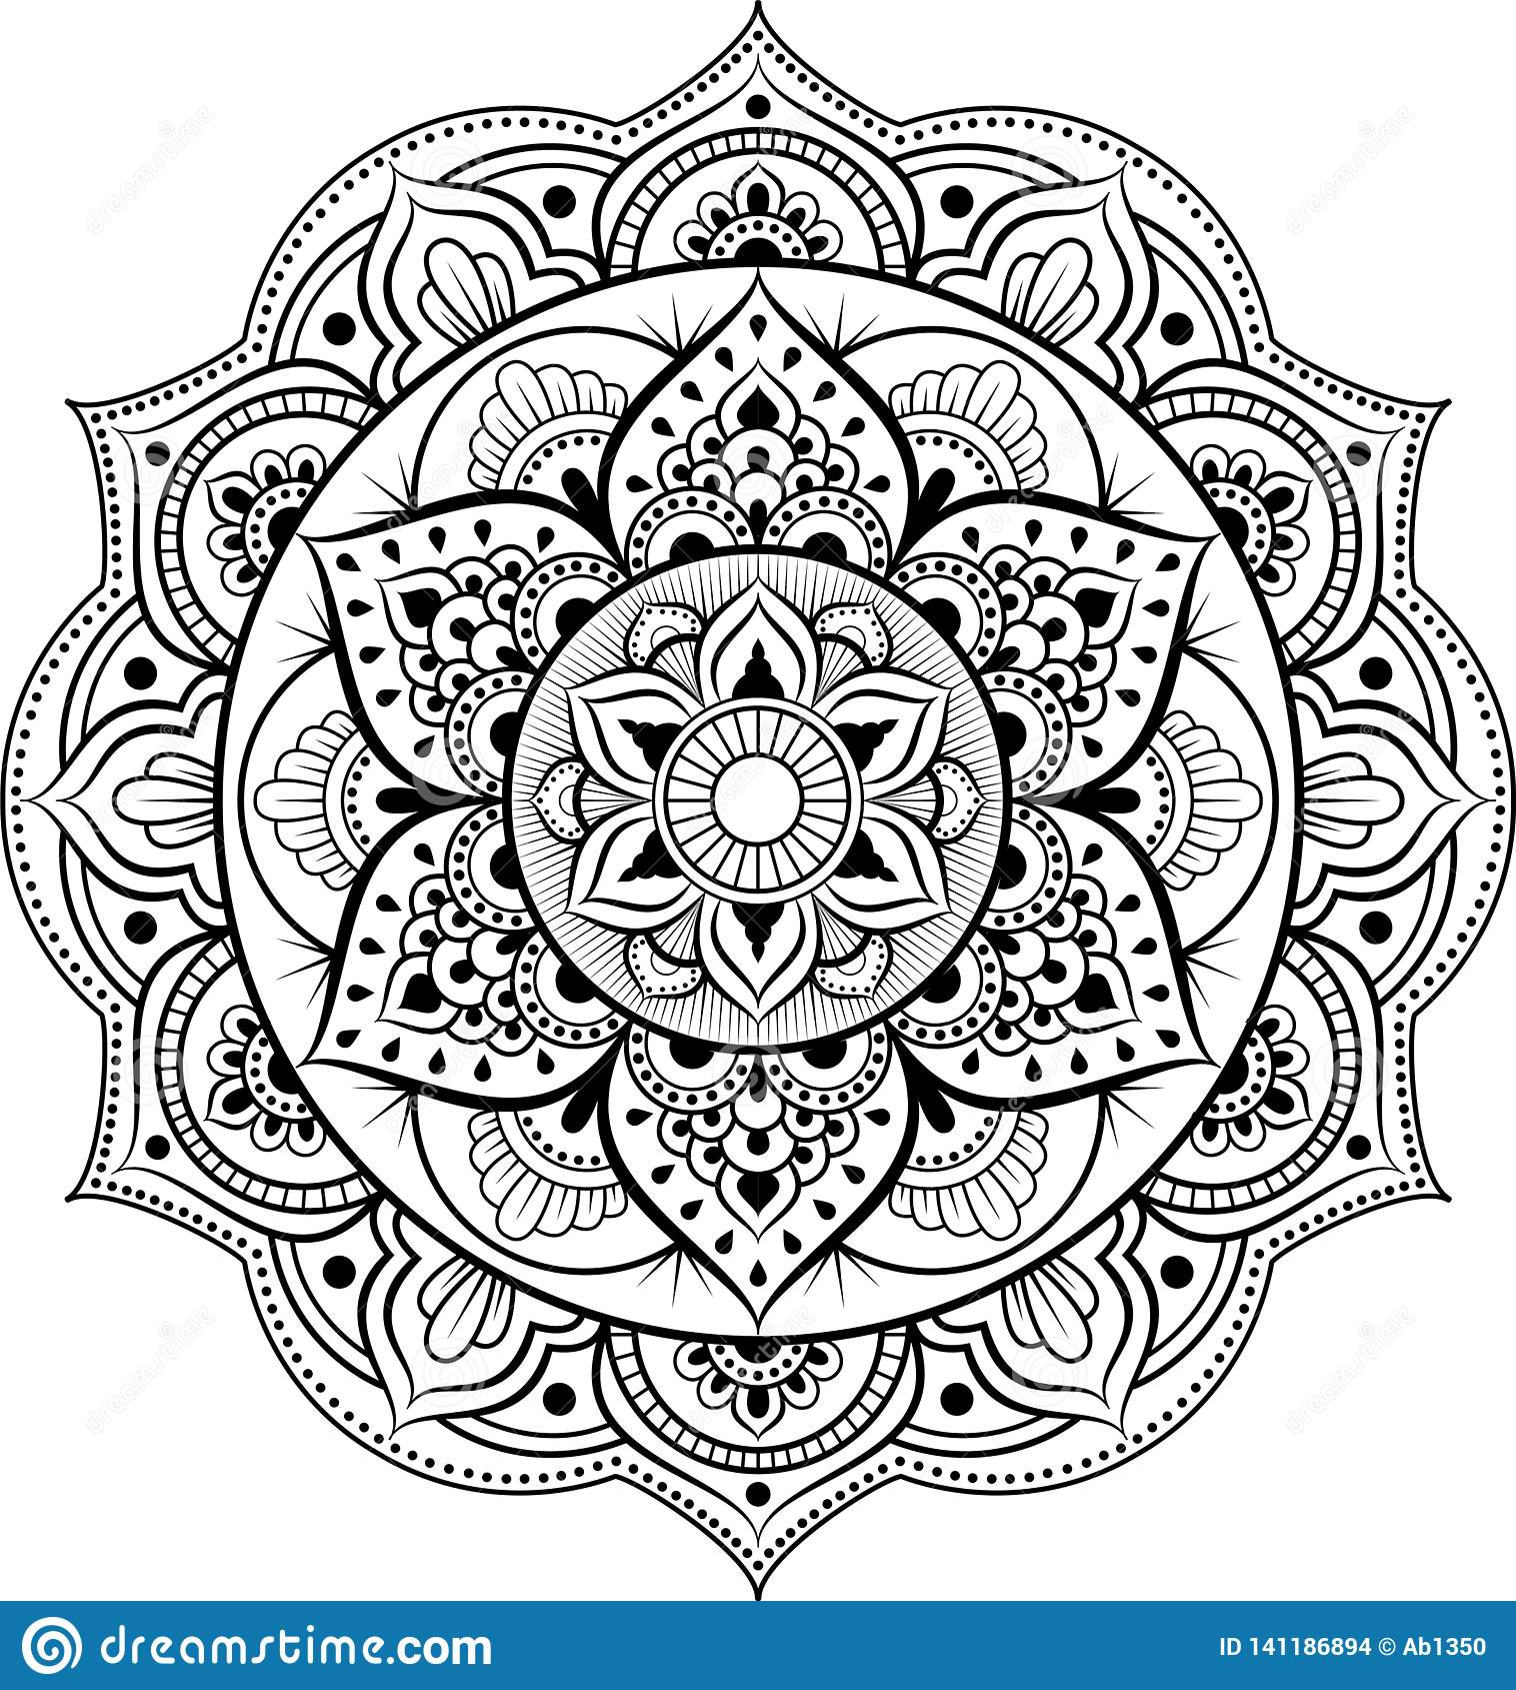 Decorative ornament in ethnic oriental style. Circular pattern in form of mandala for Henna, Mehndi, tattoo, decoration